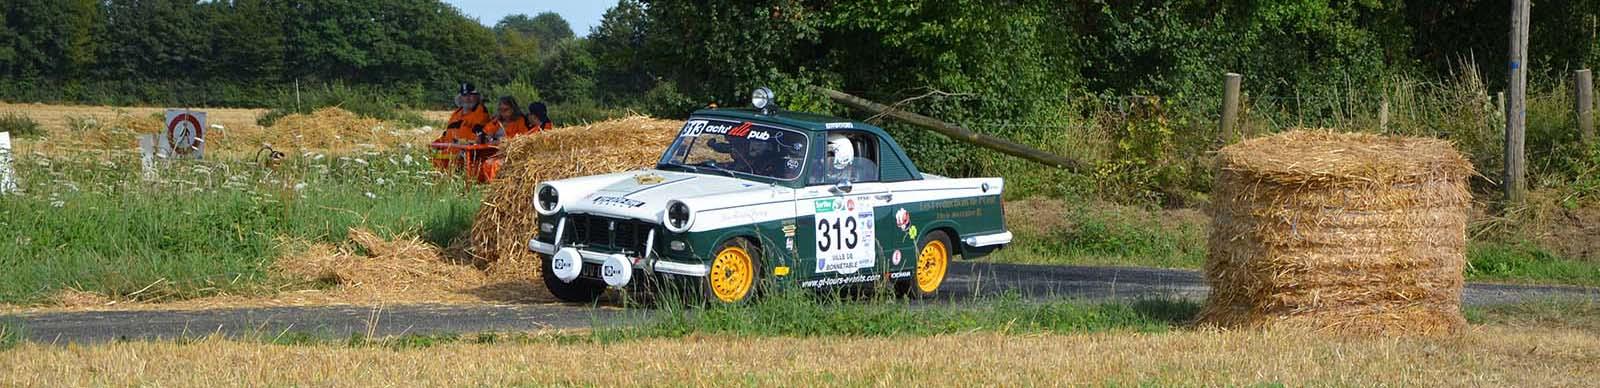 Saisons rallyes, événements automobiles